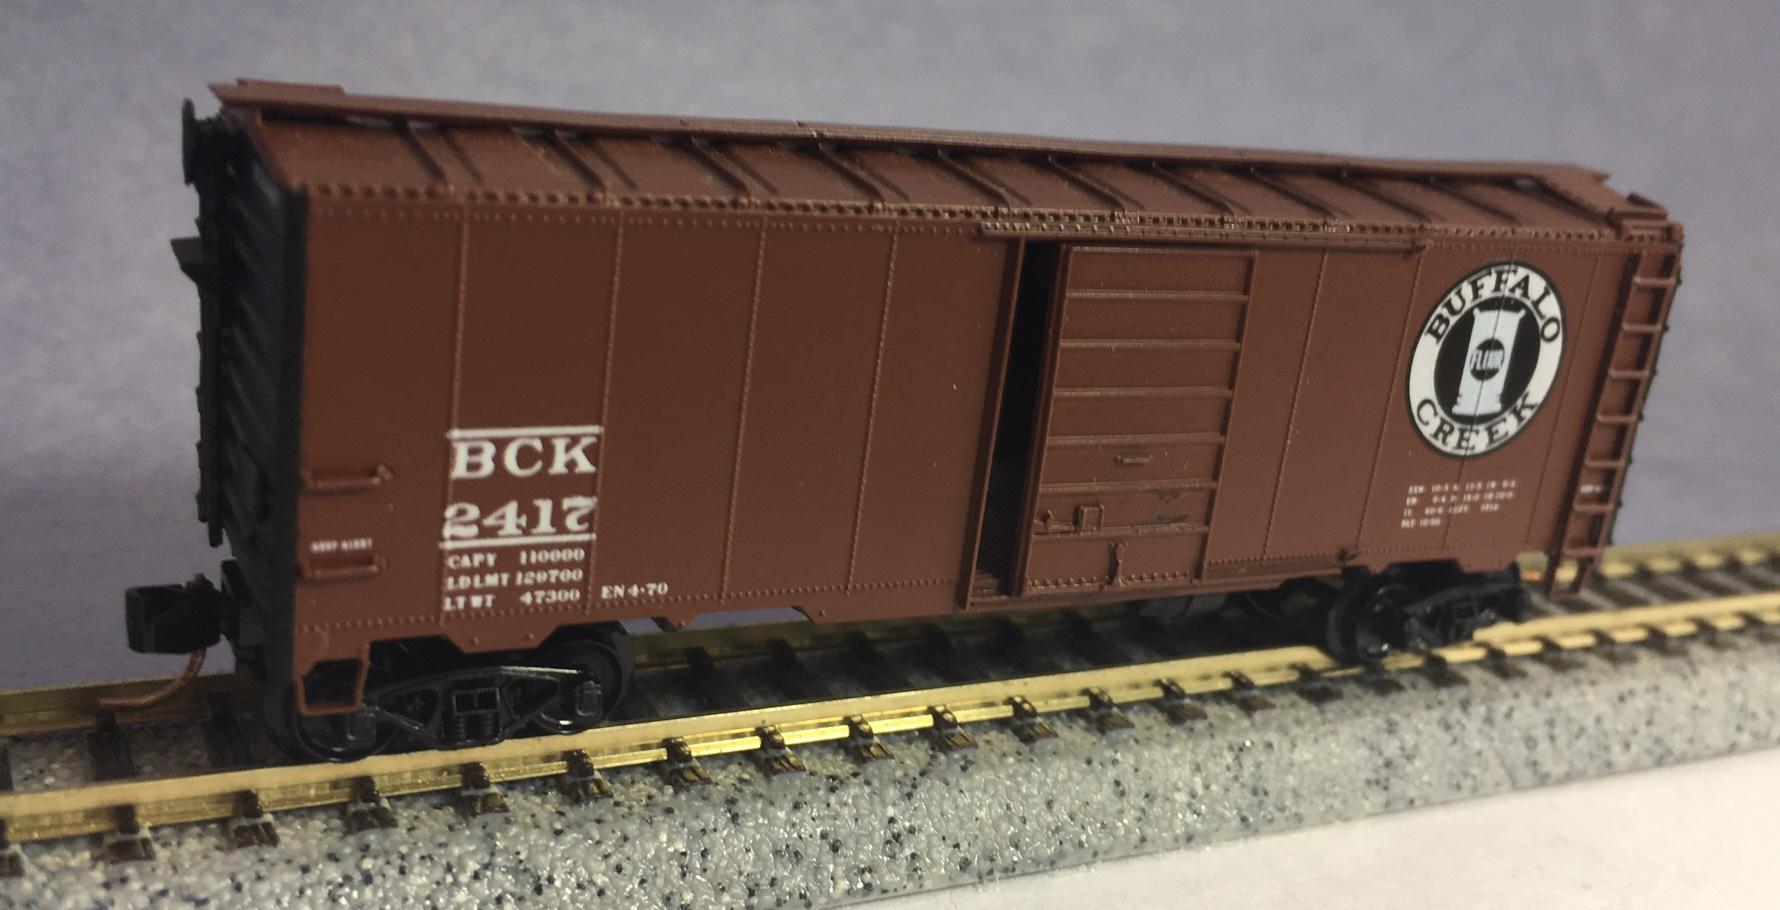 N Scale - InterMountain - 2417 - Boxcar, 40 Foot, AAR 1937 - Buffalo Creek - 2417